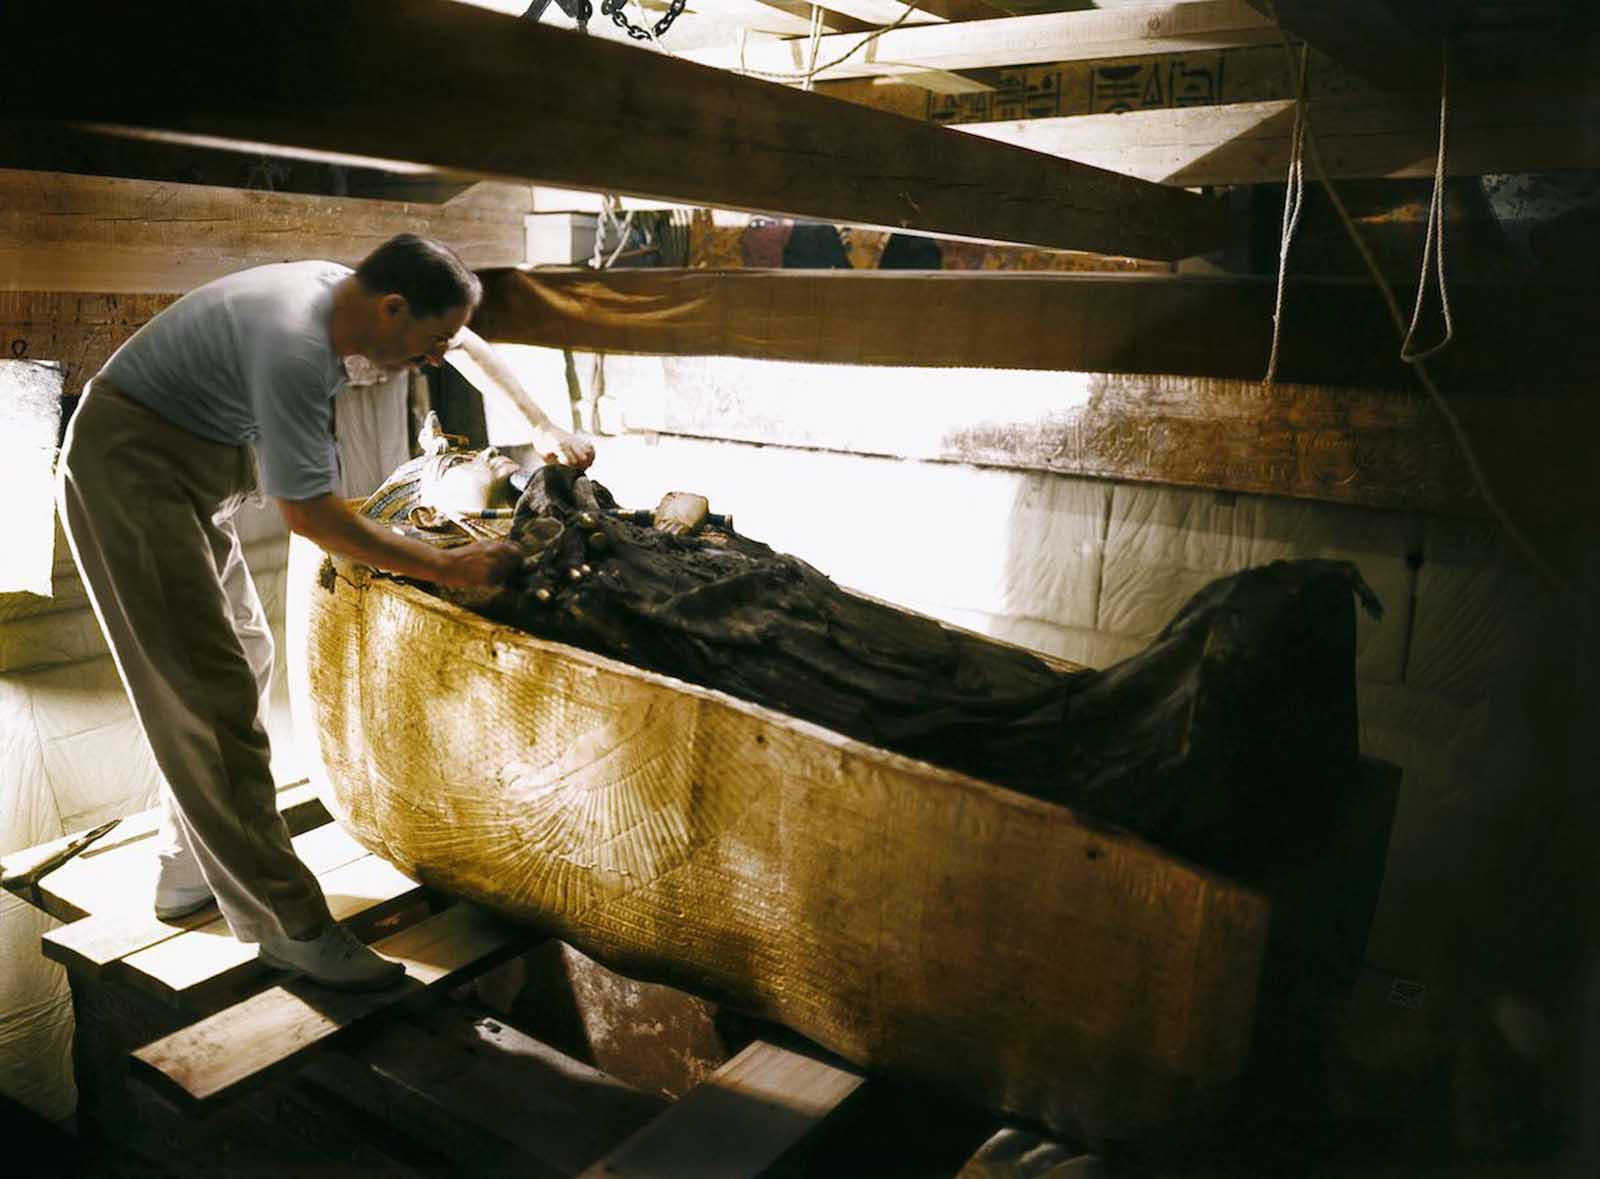 Carter examines Tutankhamun's sarcophagus.